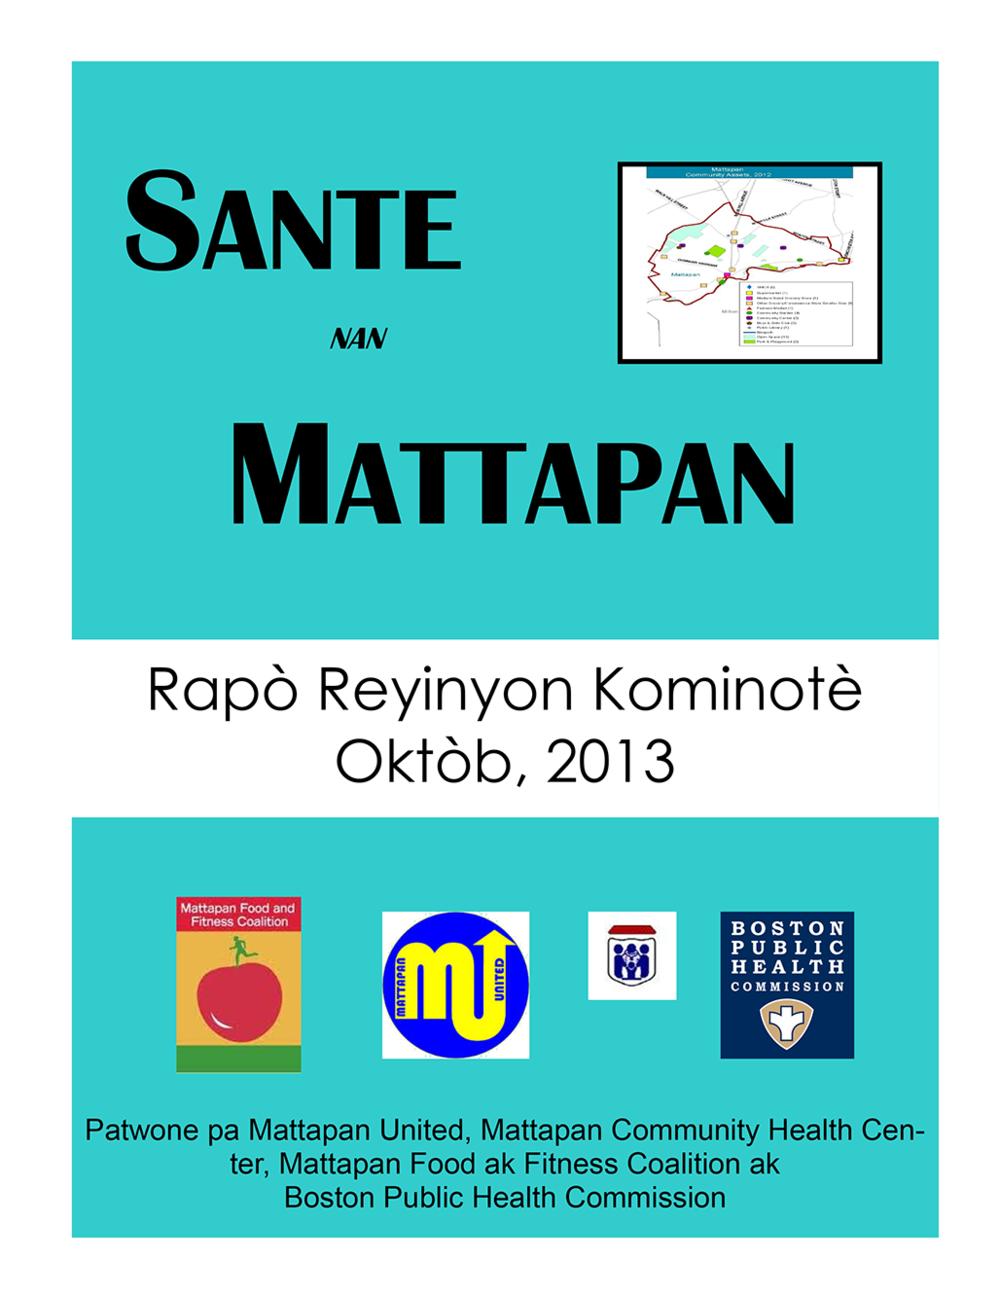 Mattapan Cover_HAITIAN CREOLE_FINAL.png